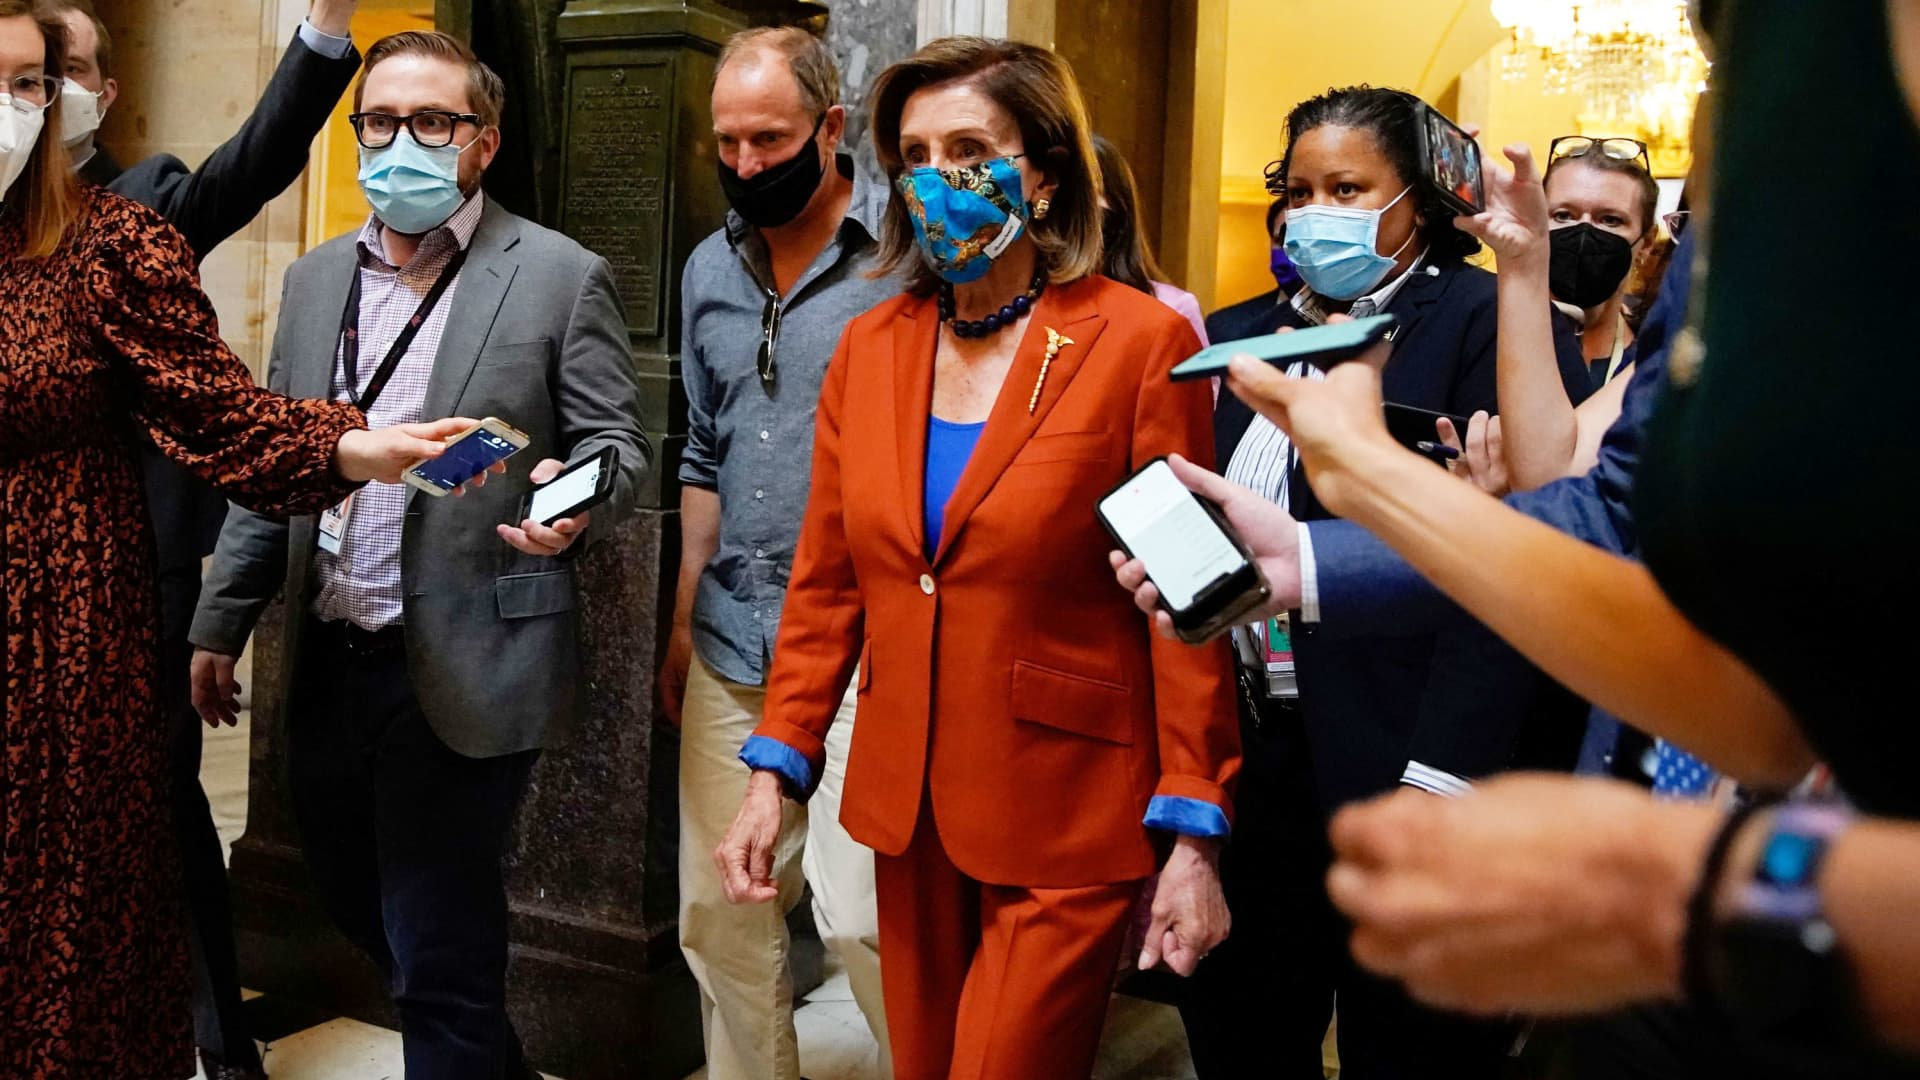 House Speaker Nancy Pelosi (D-CA) walks to the House floor at the U.S. Capitol in Washington, U.S., September 29, 2021.